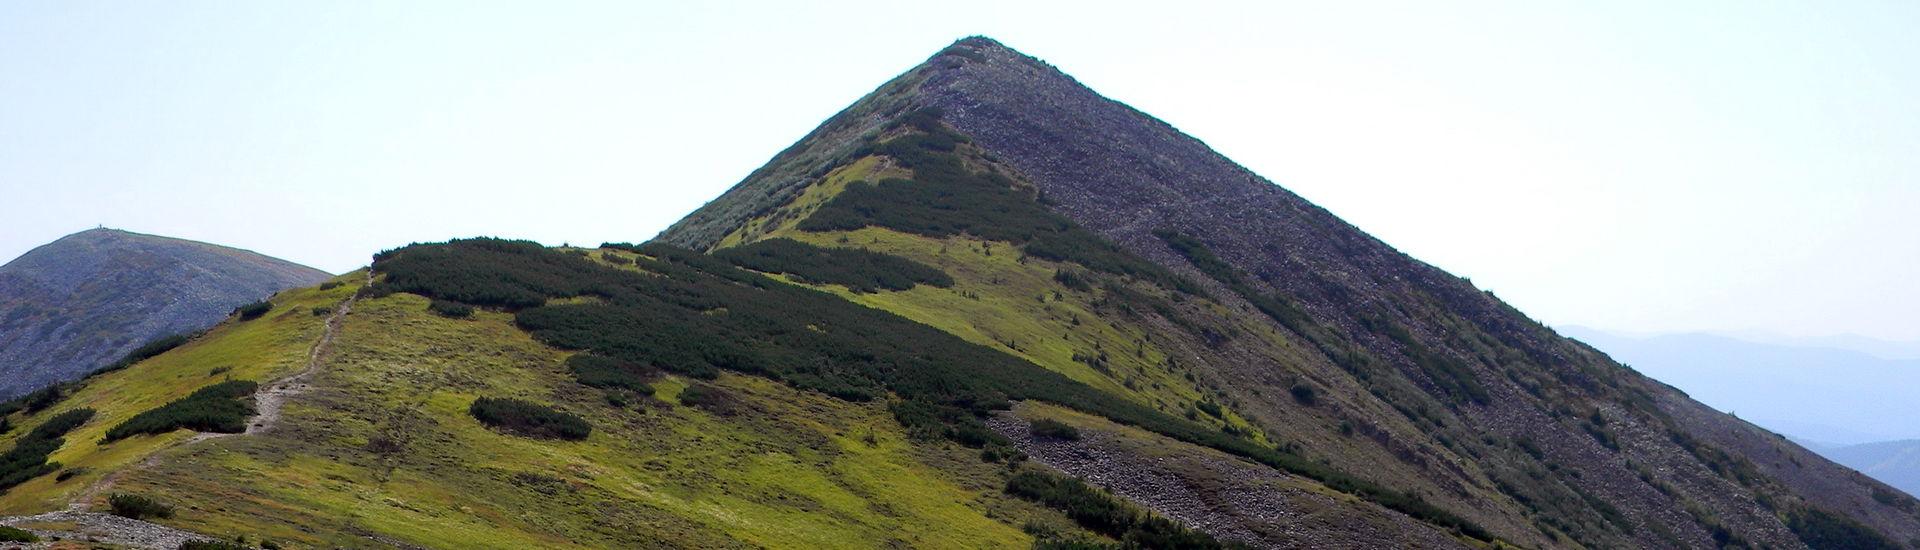 Гора Велика Сивуля, маршрут Сивулянським хребтом